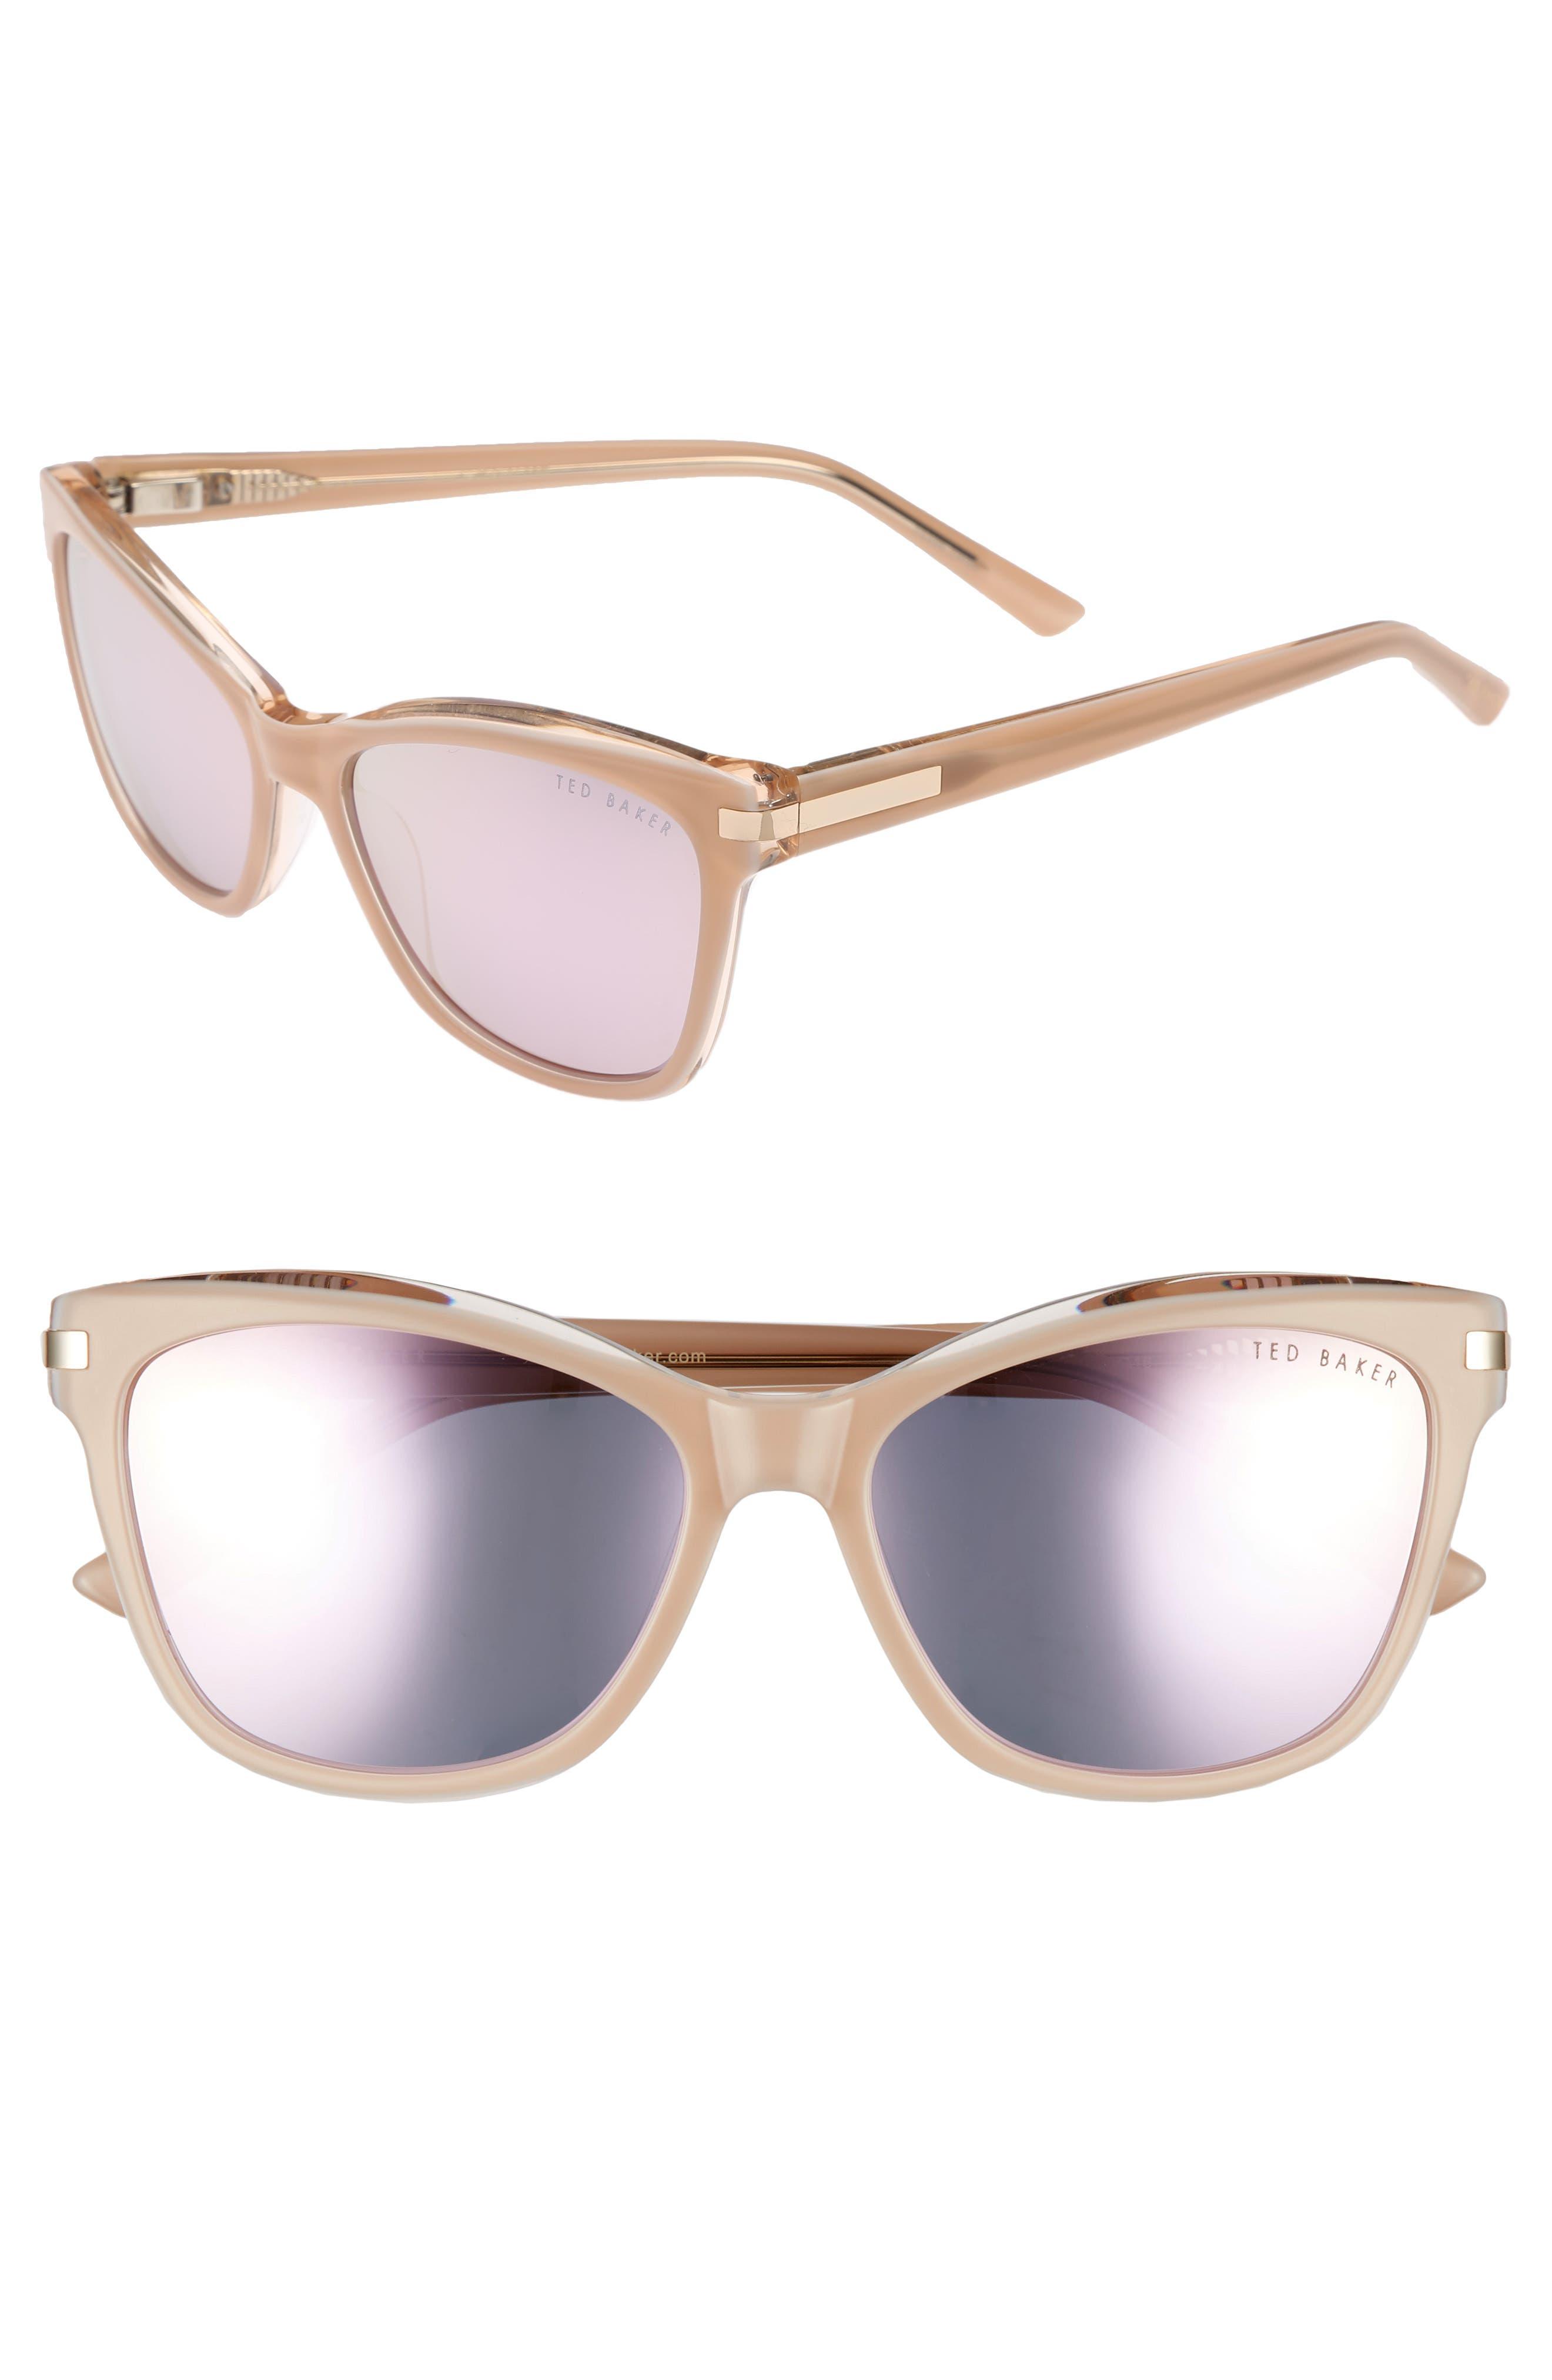 56mm Cat Eye Sunglasses,                             Main thumbnail 1, color,                             BLUSH